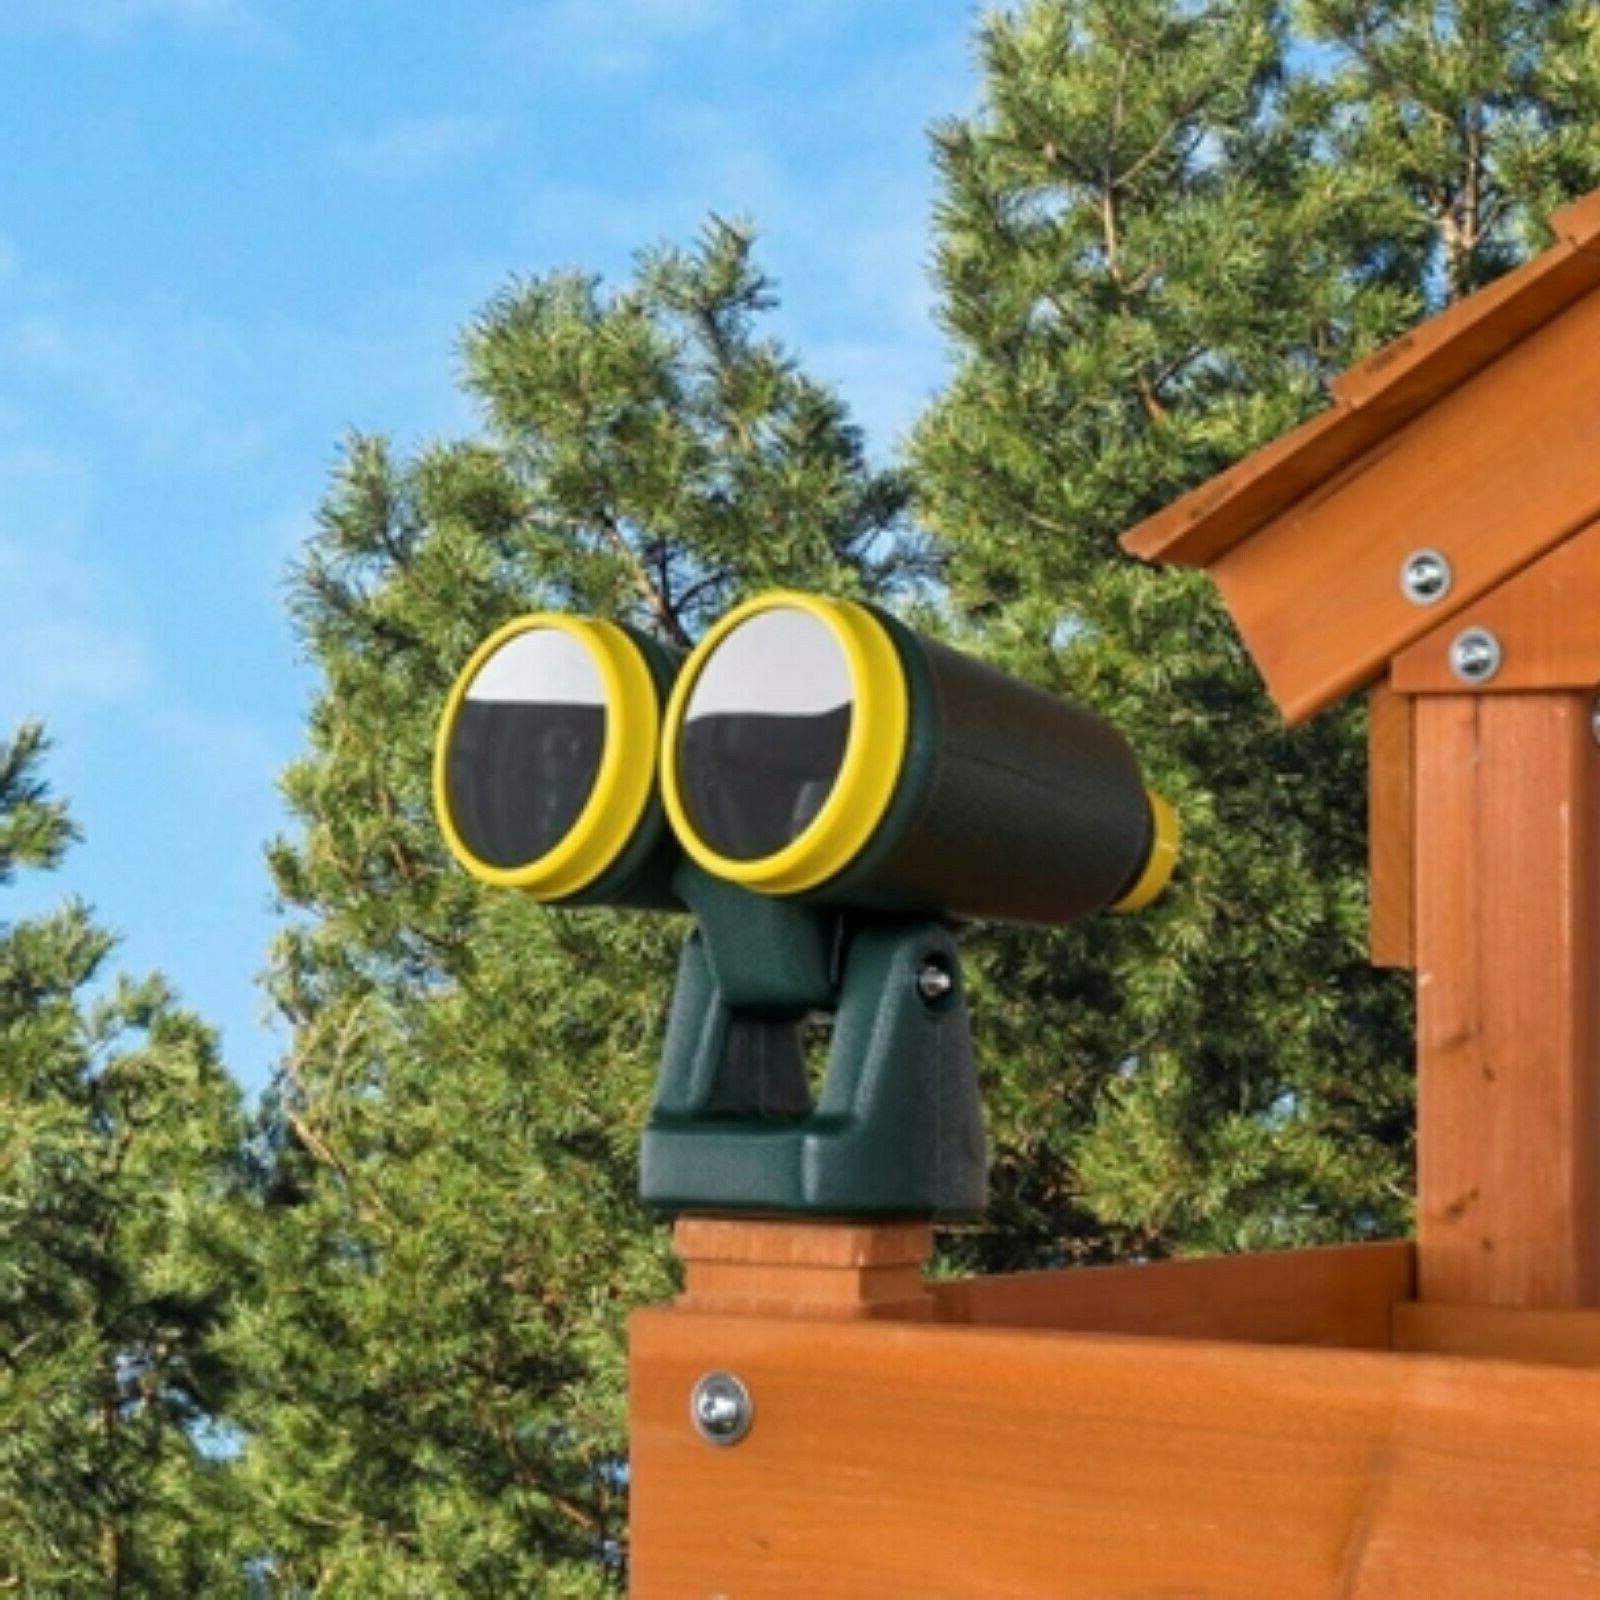 plastic playset binoculars swing set